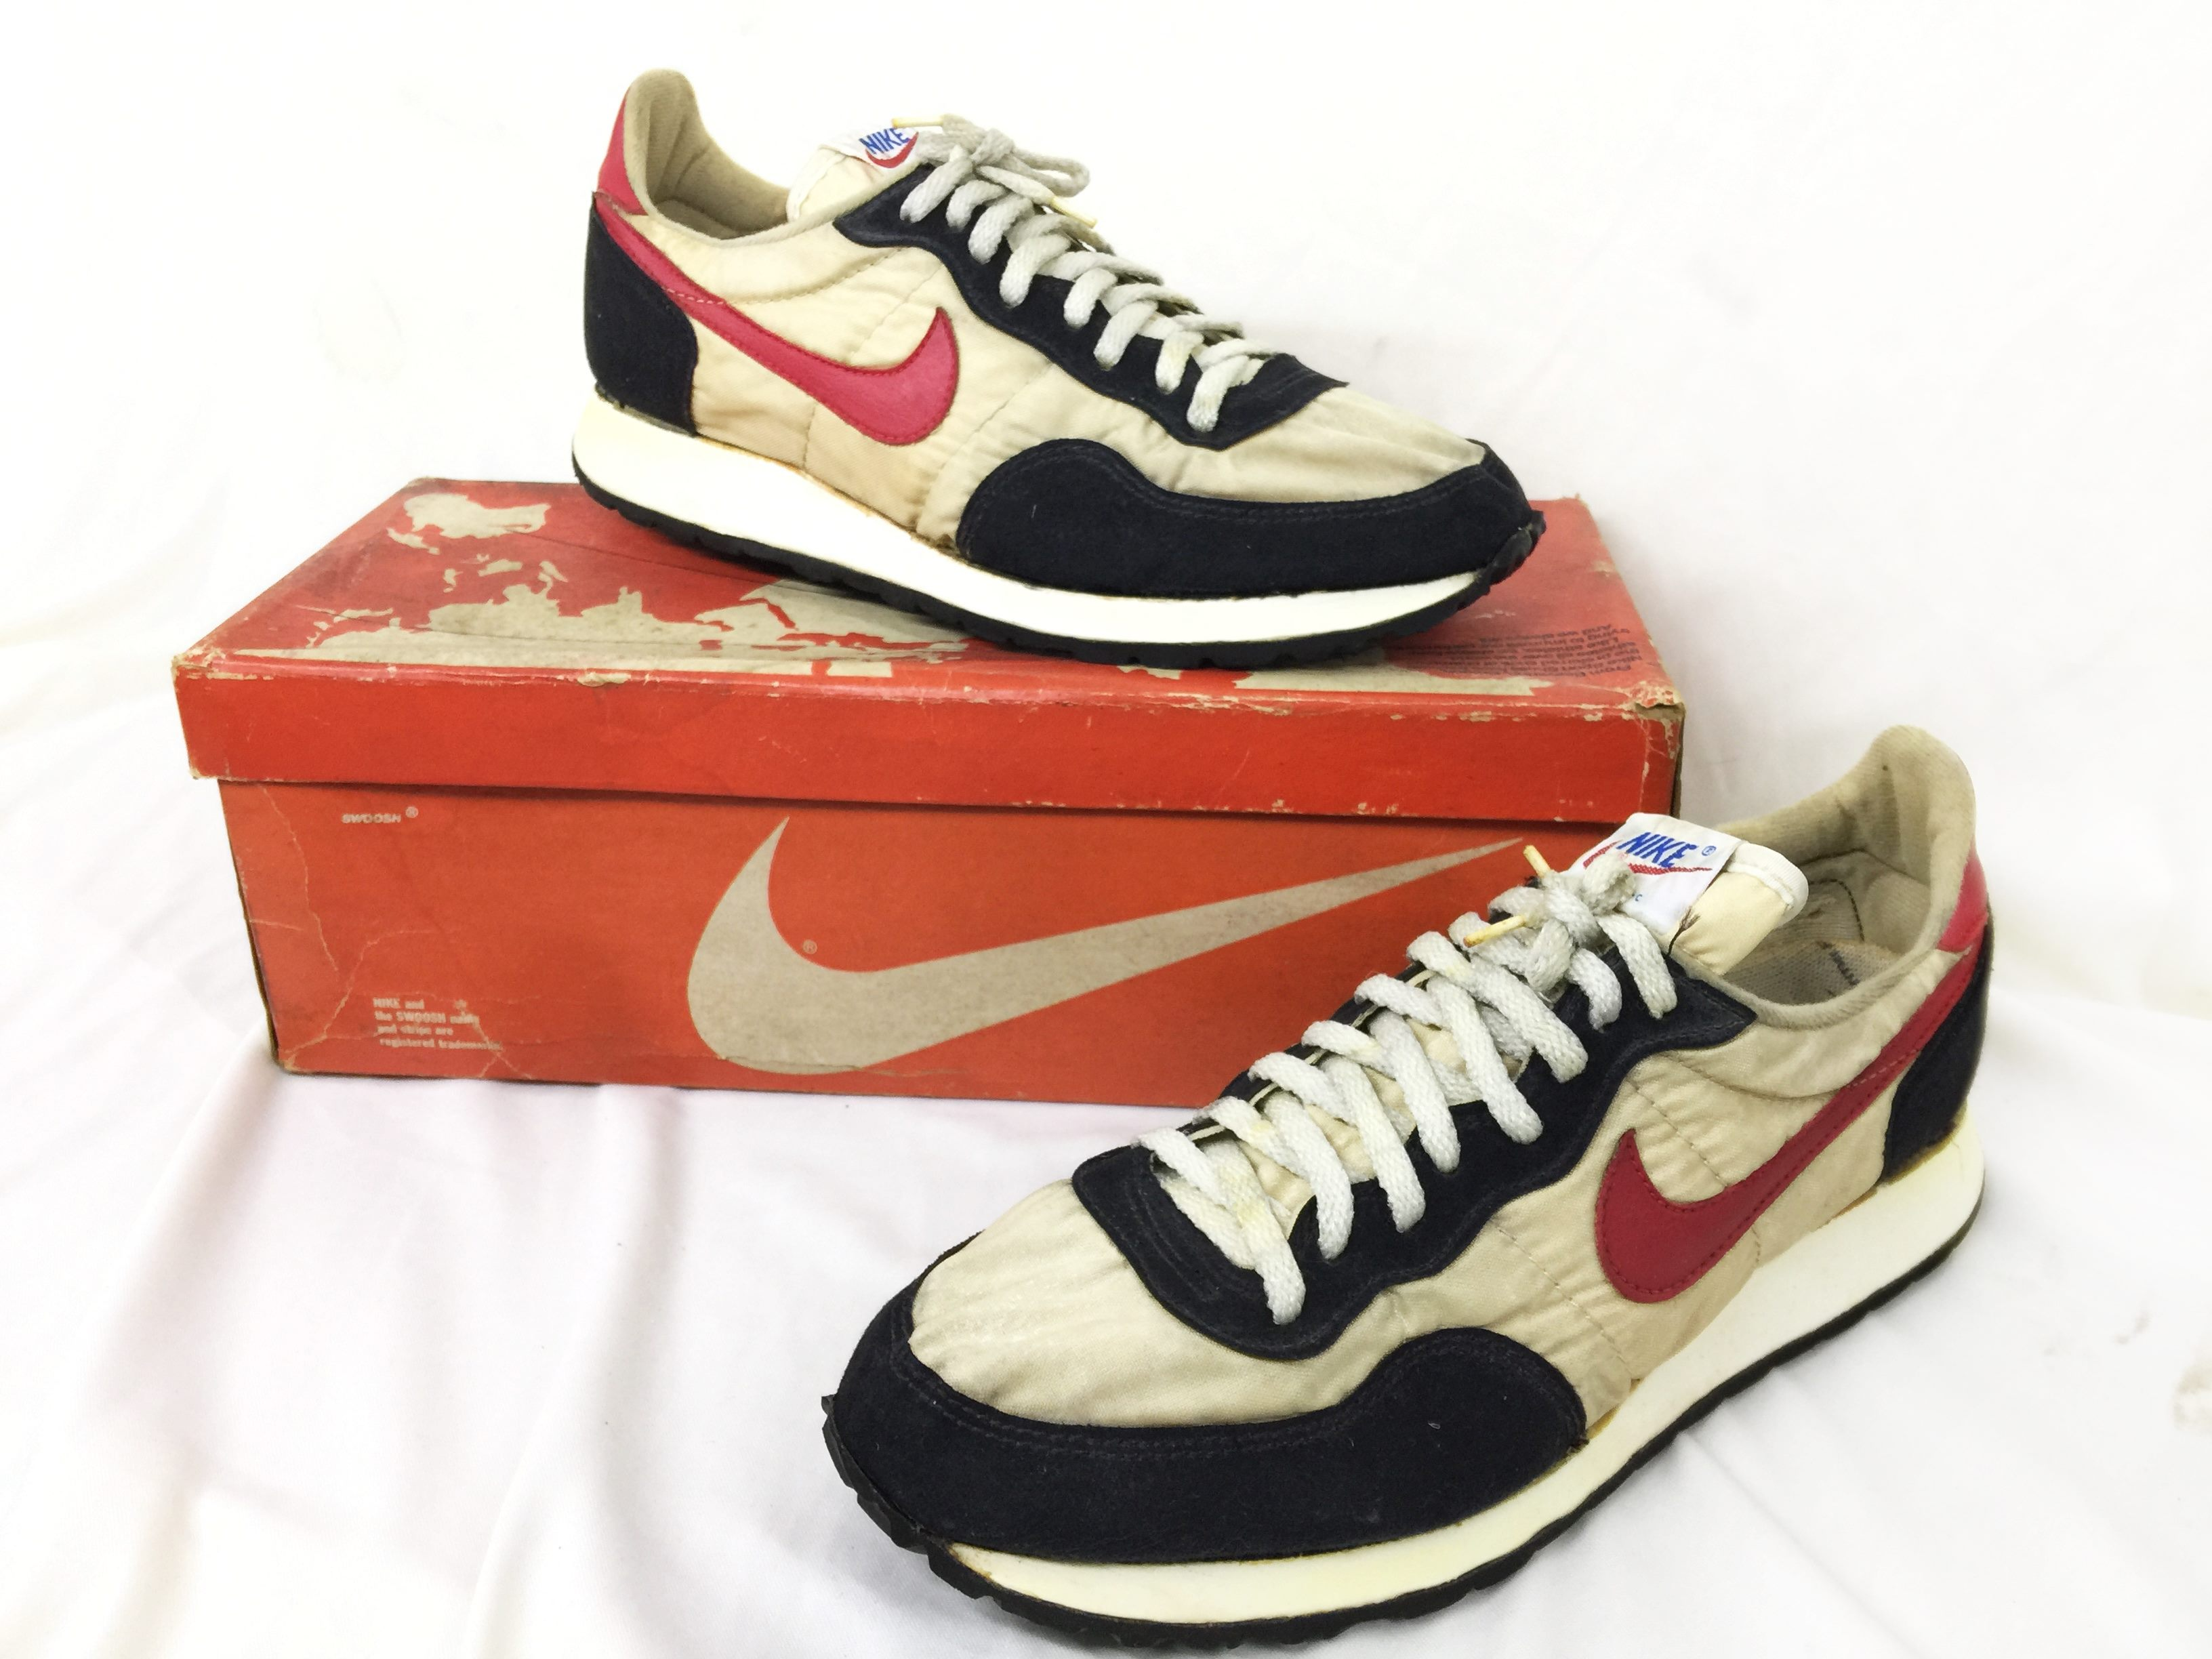 Cancelar Respetuoso del medio ambiente Aburrido  Nike Nike Terra Tc Vintage Shoes/vintage Nike Sneakers | Grailed